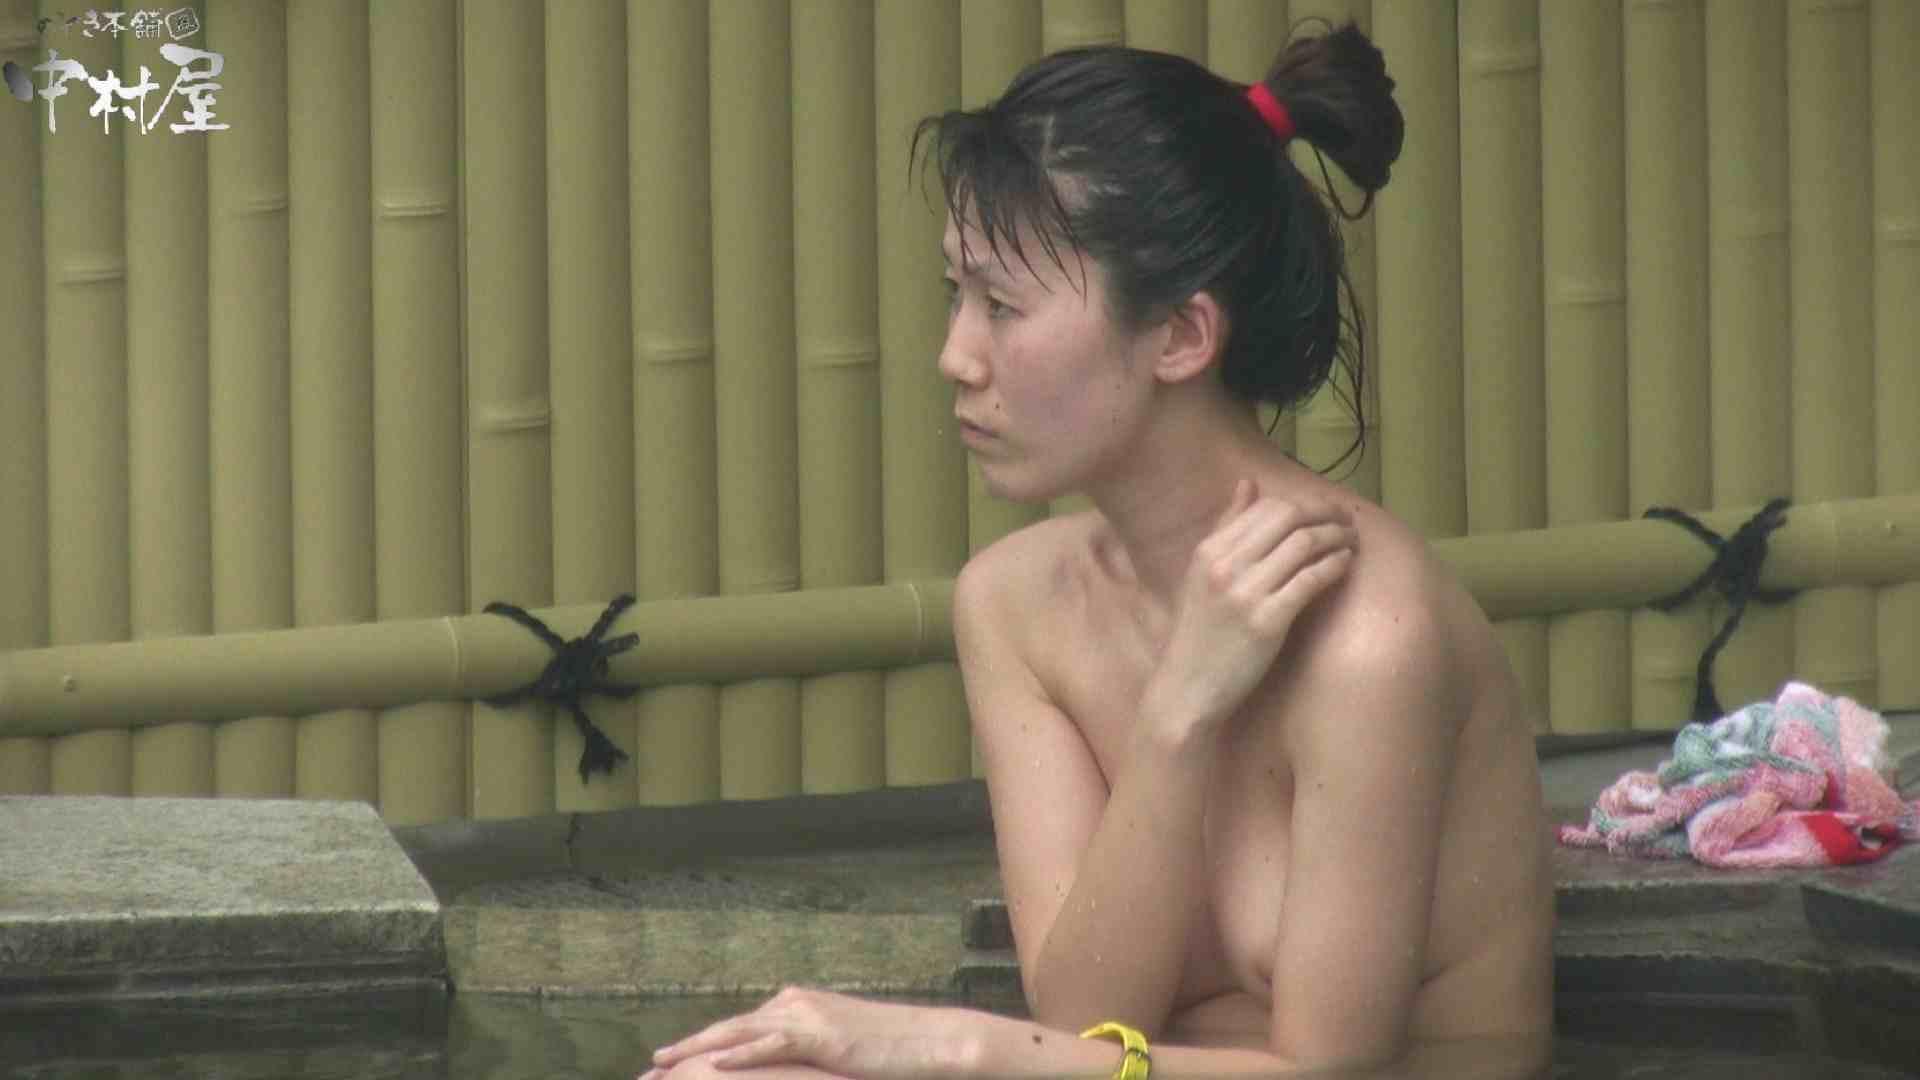 Aquaな露天風呂Vol.896 盗撮映像  81Pix 23